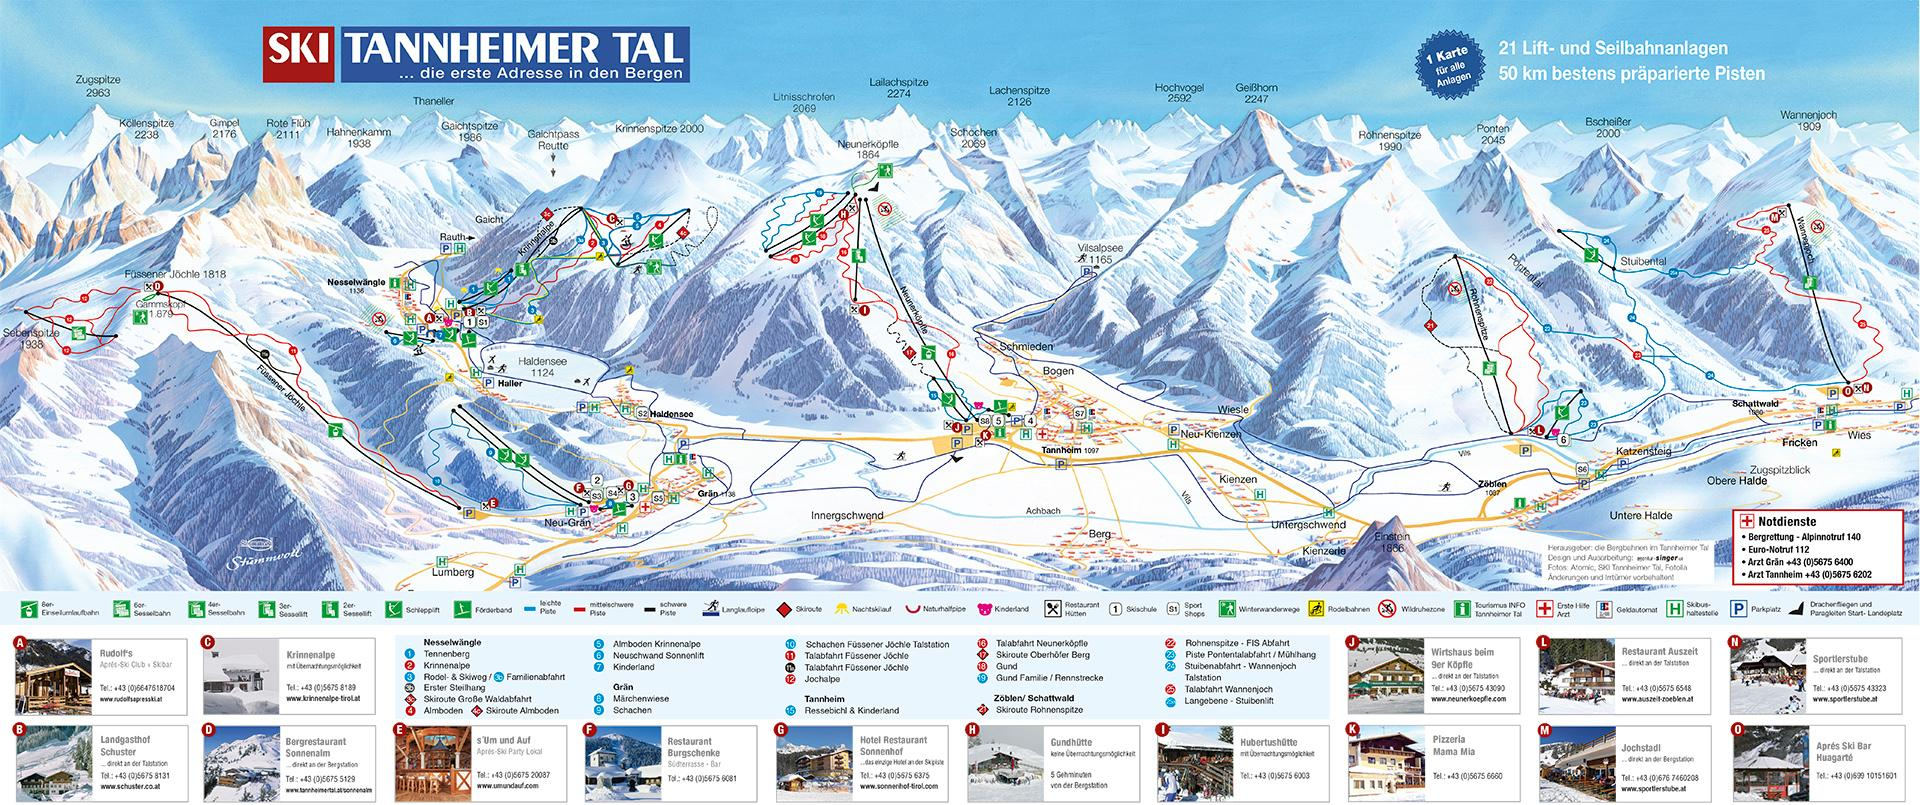 Tannheimer Tal Karte.Ski Tannheimer Tal Ski Resort Outdooractive Com